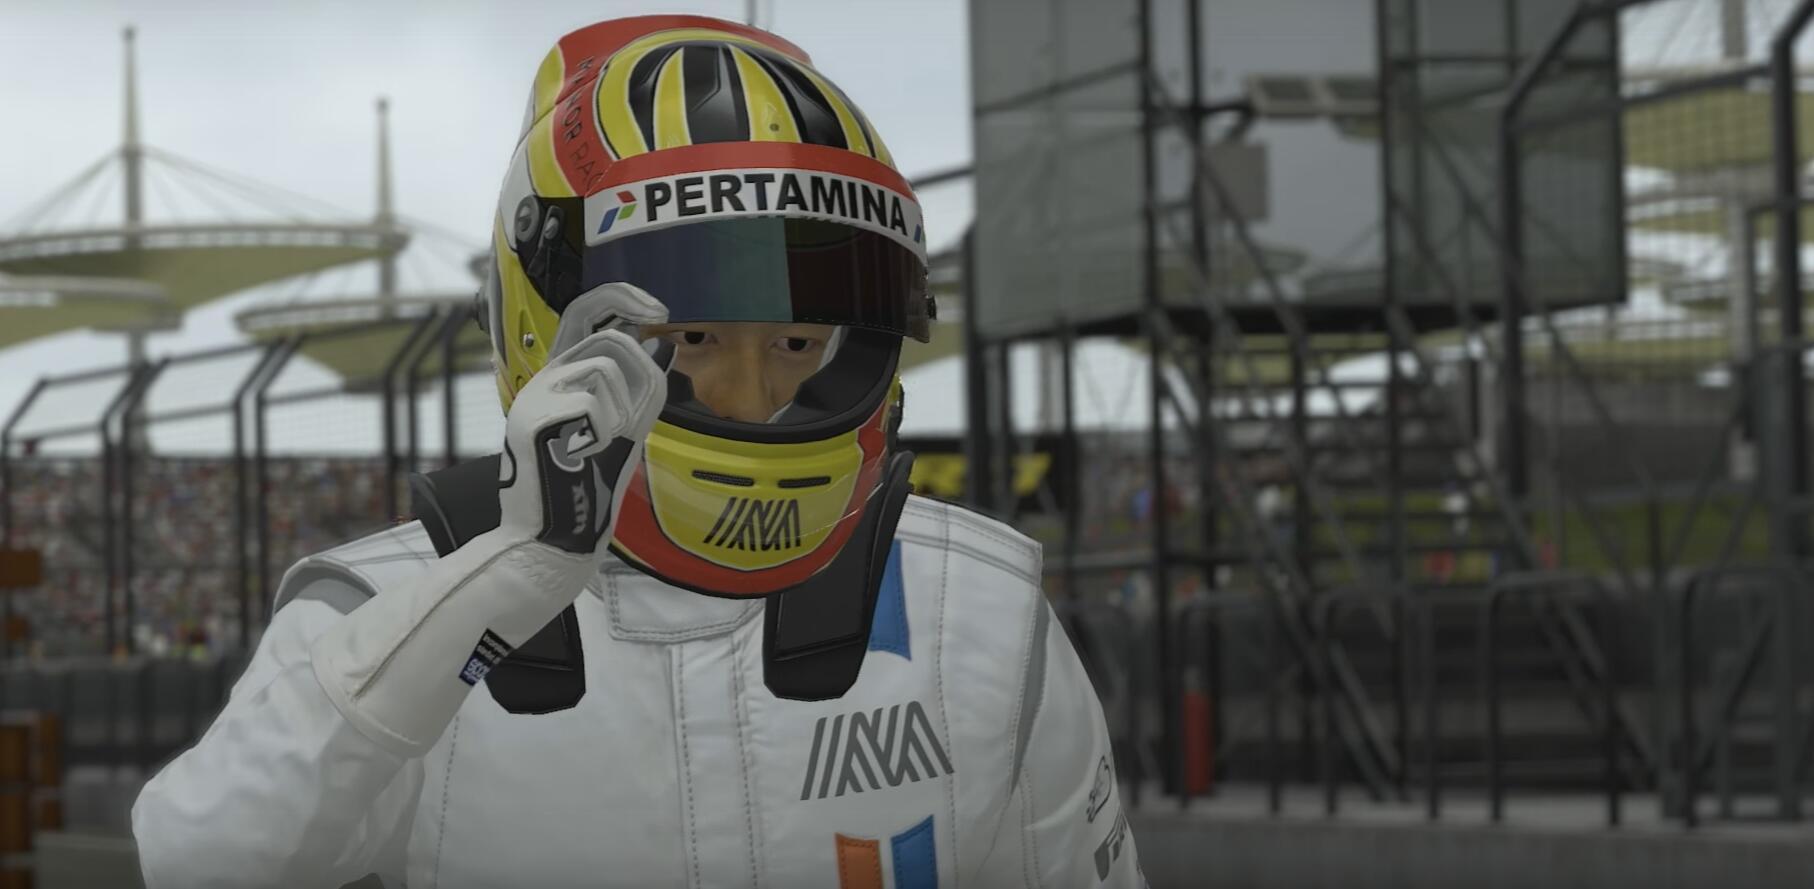 《F1 2016》新场景预告演示